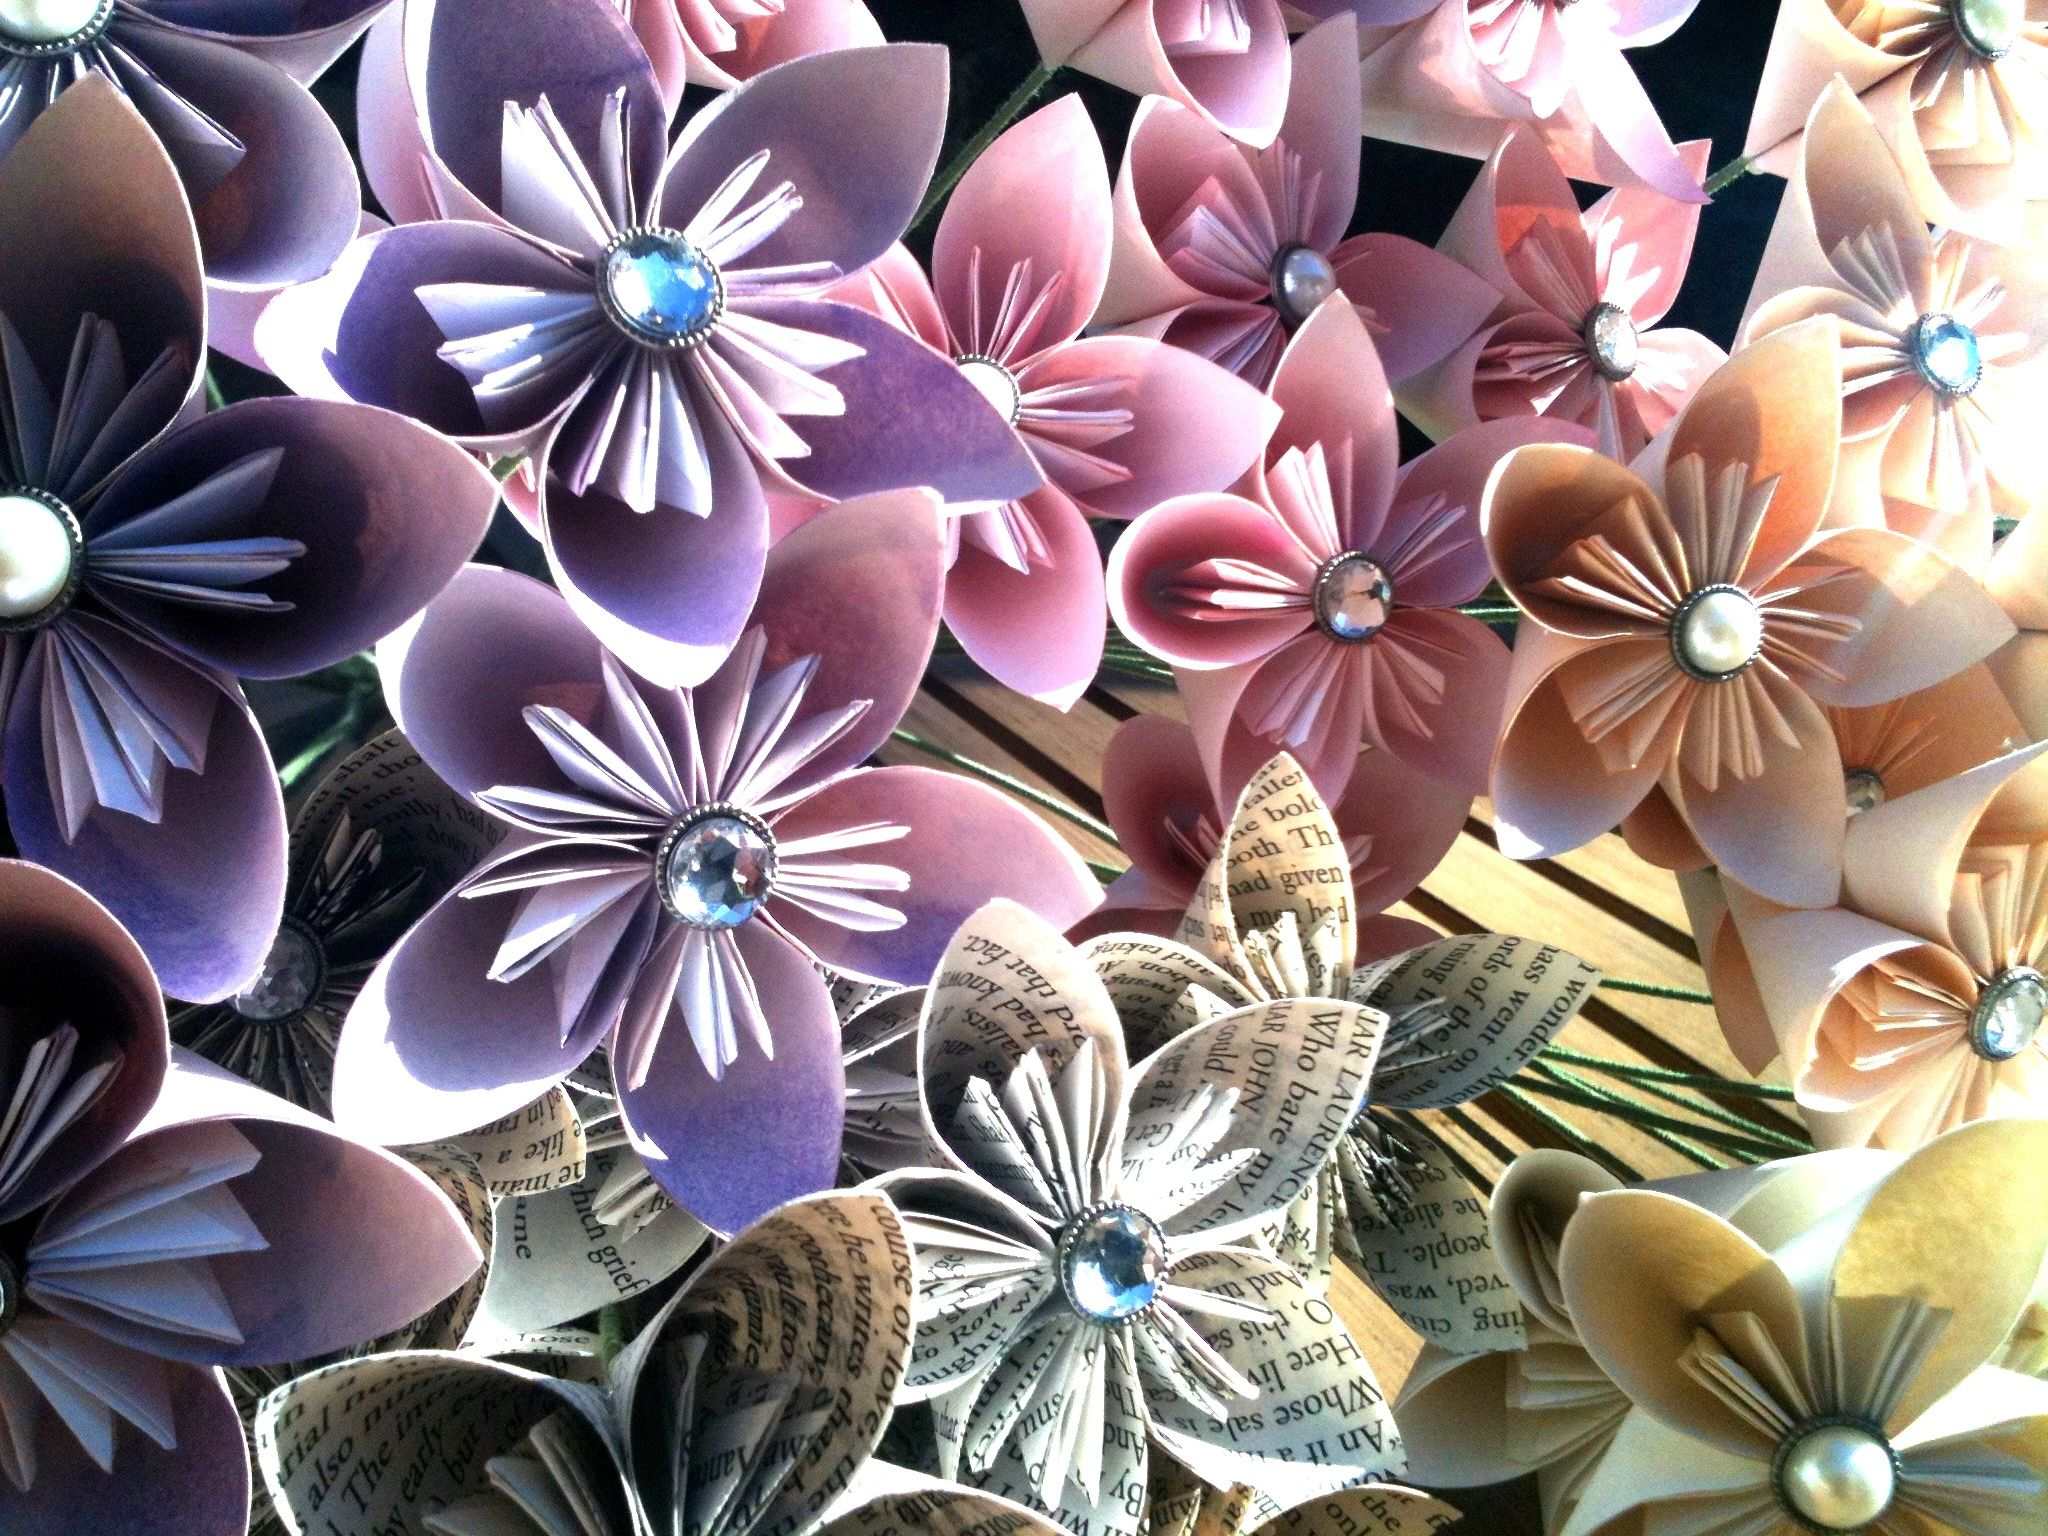 Origami flowers for sale thecranefactorysy products i origami flowers for sale thecranefactorysy mightylinksfo